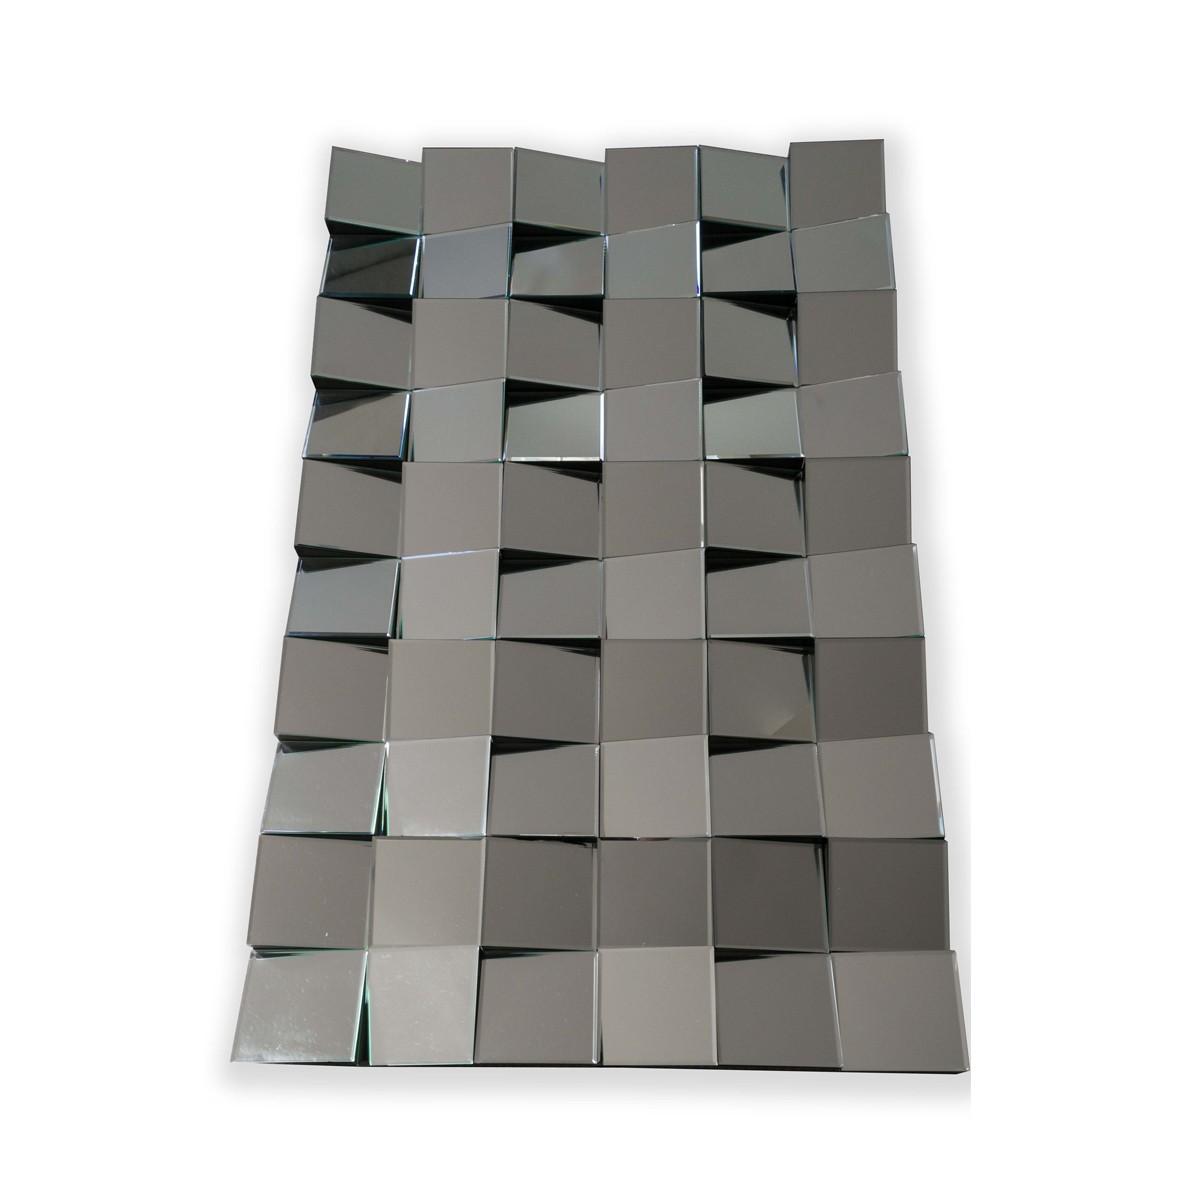 Fritz - Flattering Angled Block Mirror  (Rectangle)